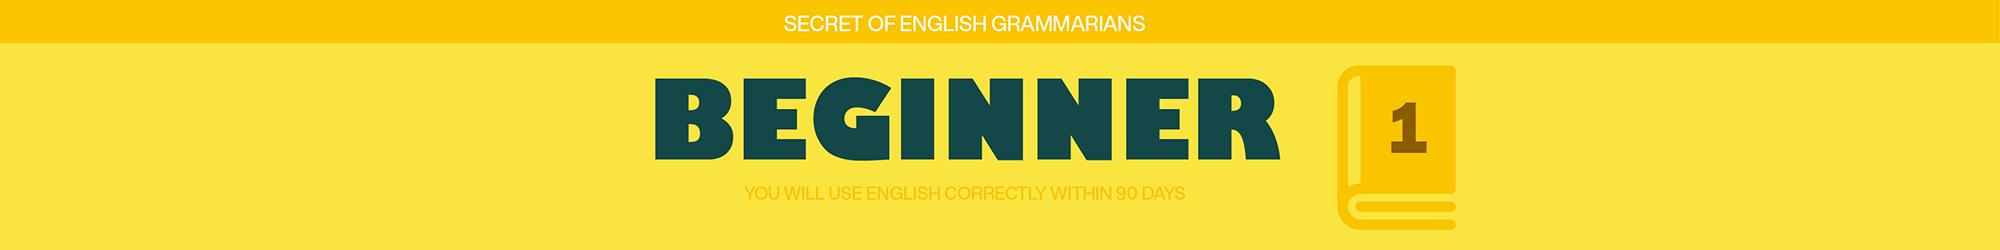 BASIC ENGLISH GRAMMAR banner